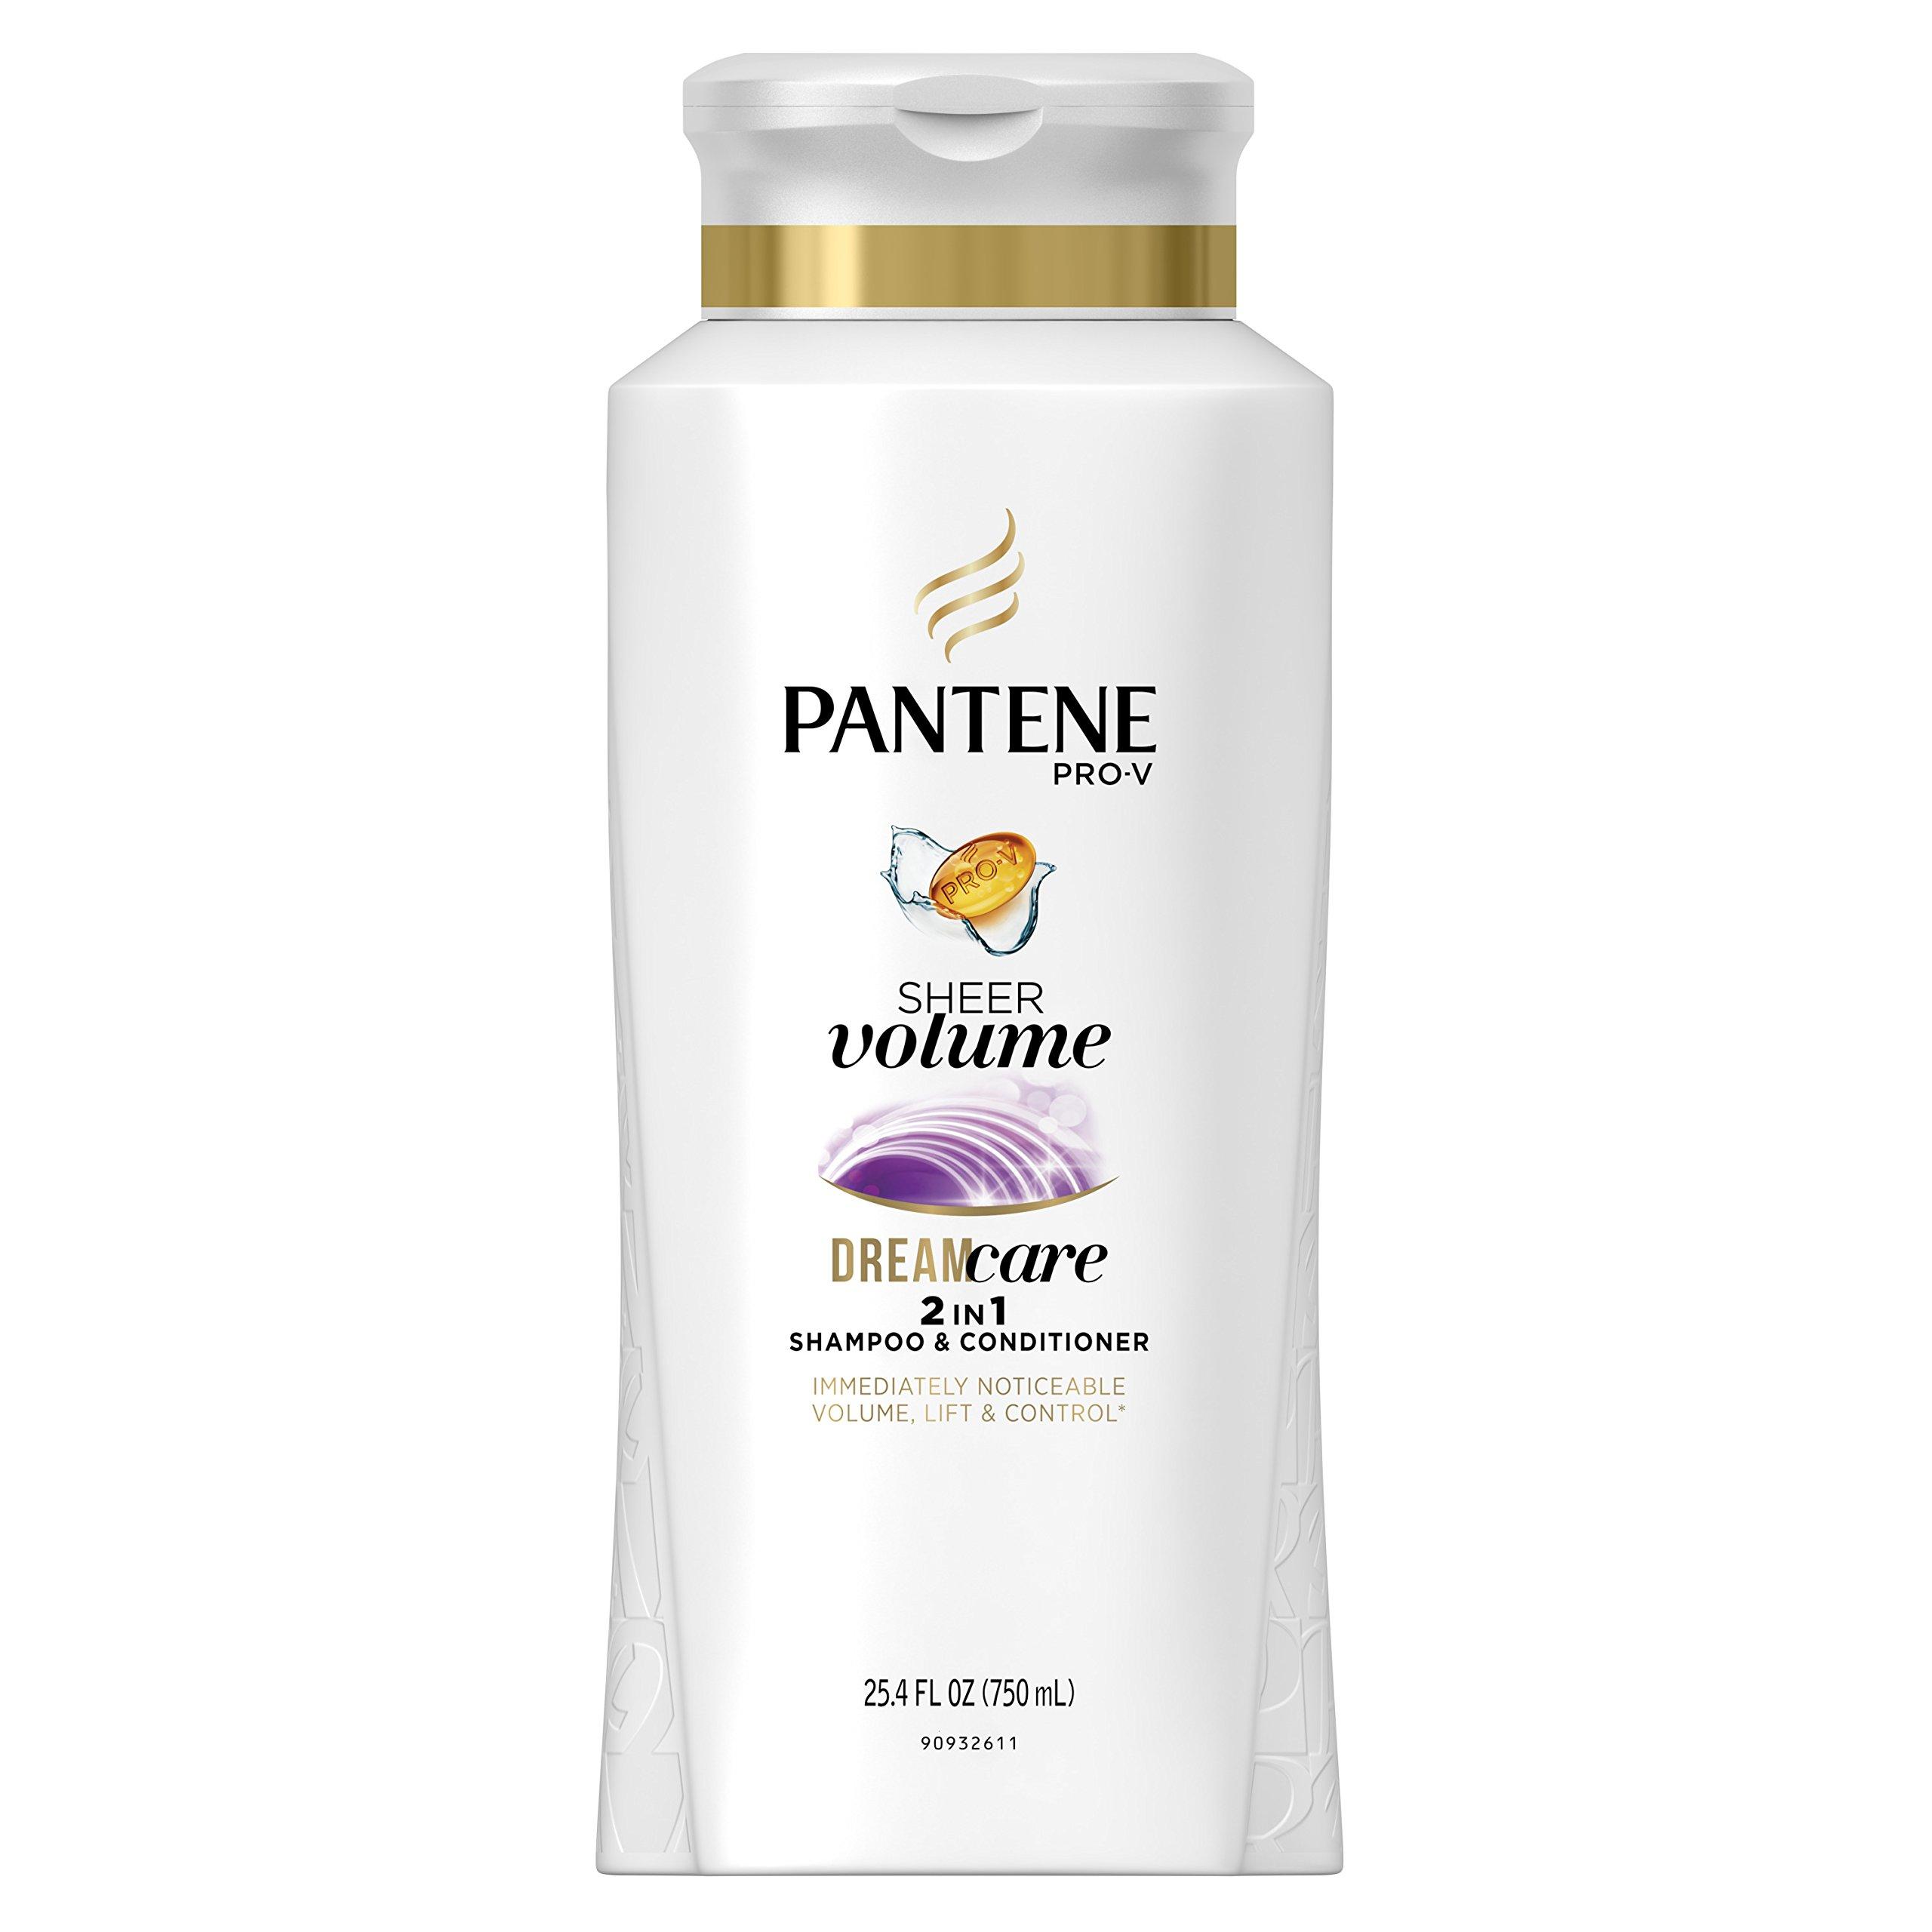 Pantene Pro-V Volume 2-In-1 Shampoo & Conditioner 25.4 Fl Oz by Pantene